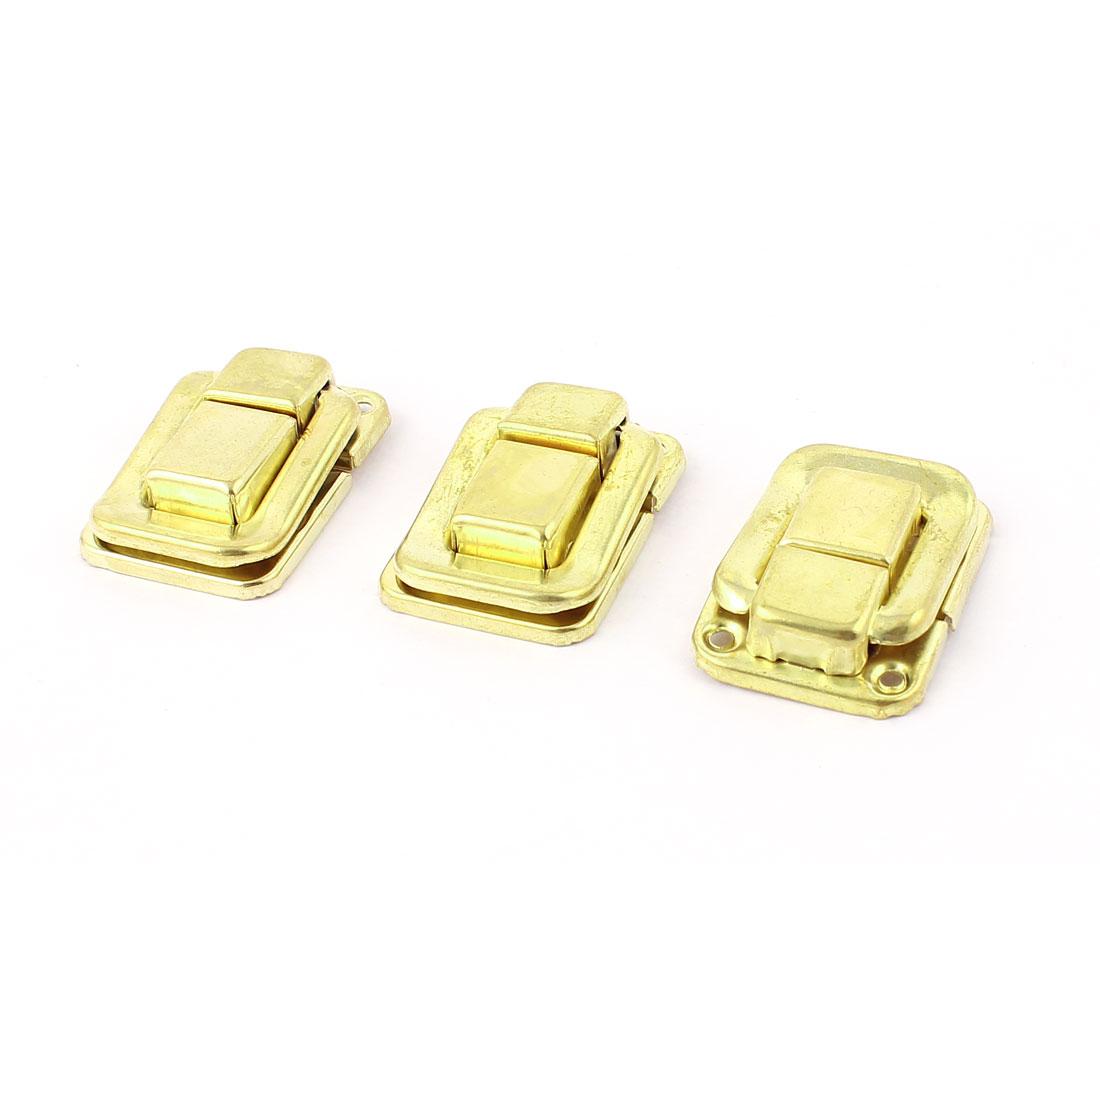 Furniture Hardware Box Case Locking Hasp Latch Locker 3pcs Gold Tone